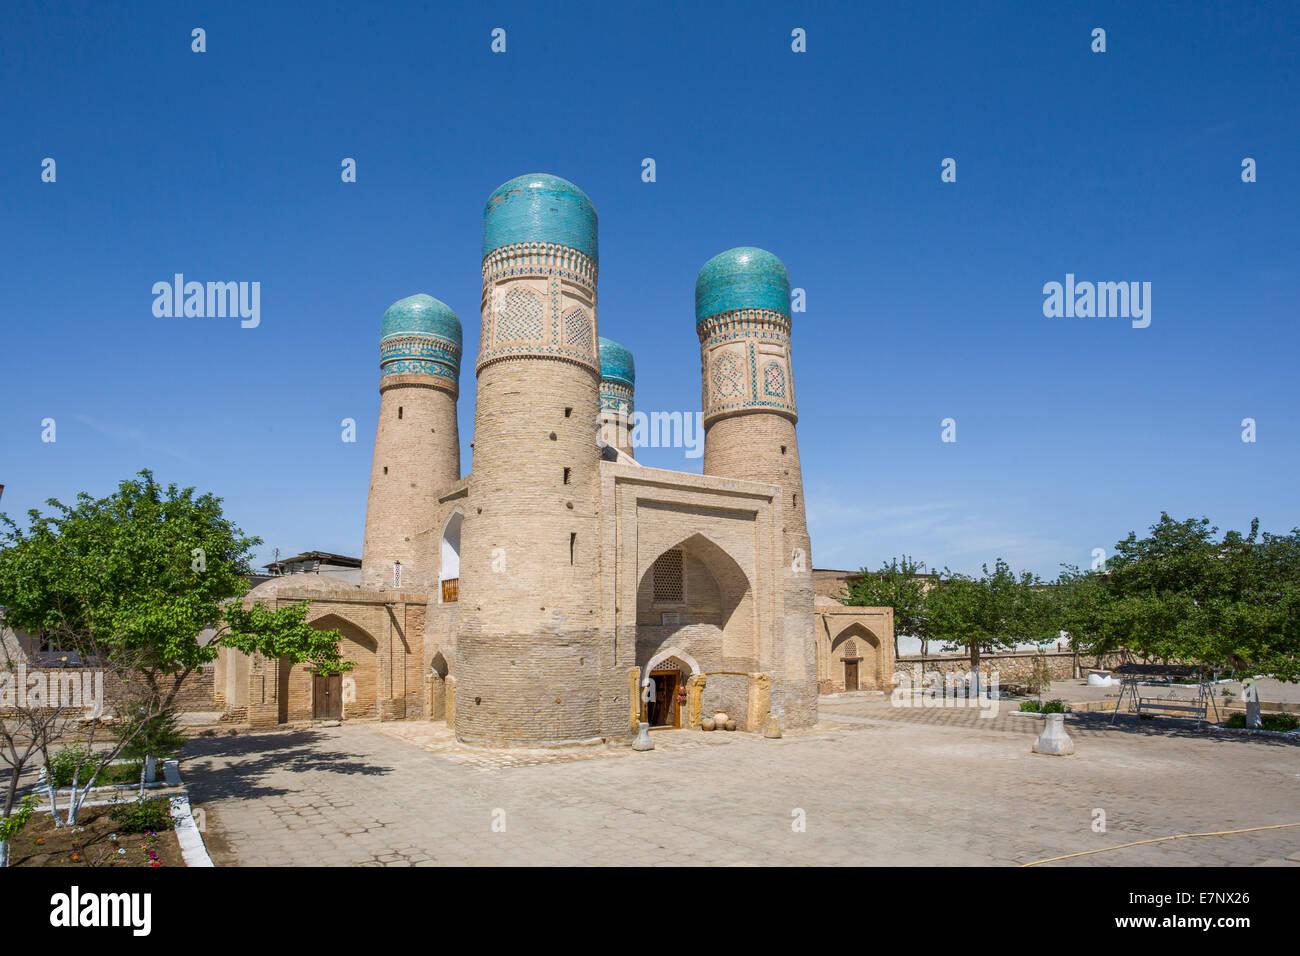 world heritage, Bukhara, Chor Minor, Madrasah, Uzbekistan, Central Asia, Asia, architecture, city, colourful, famous, - Stock Image